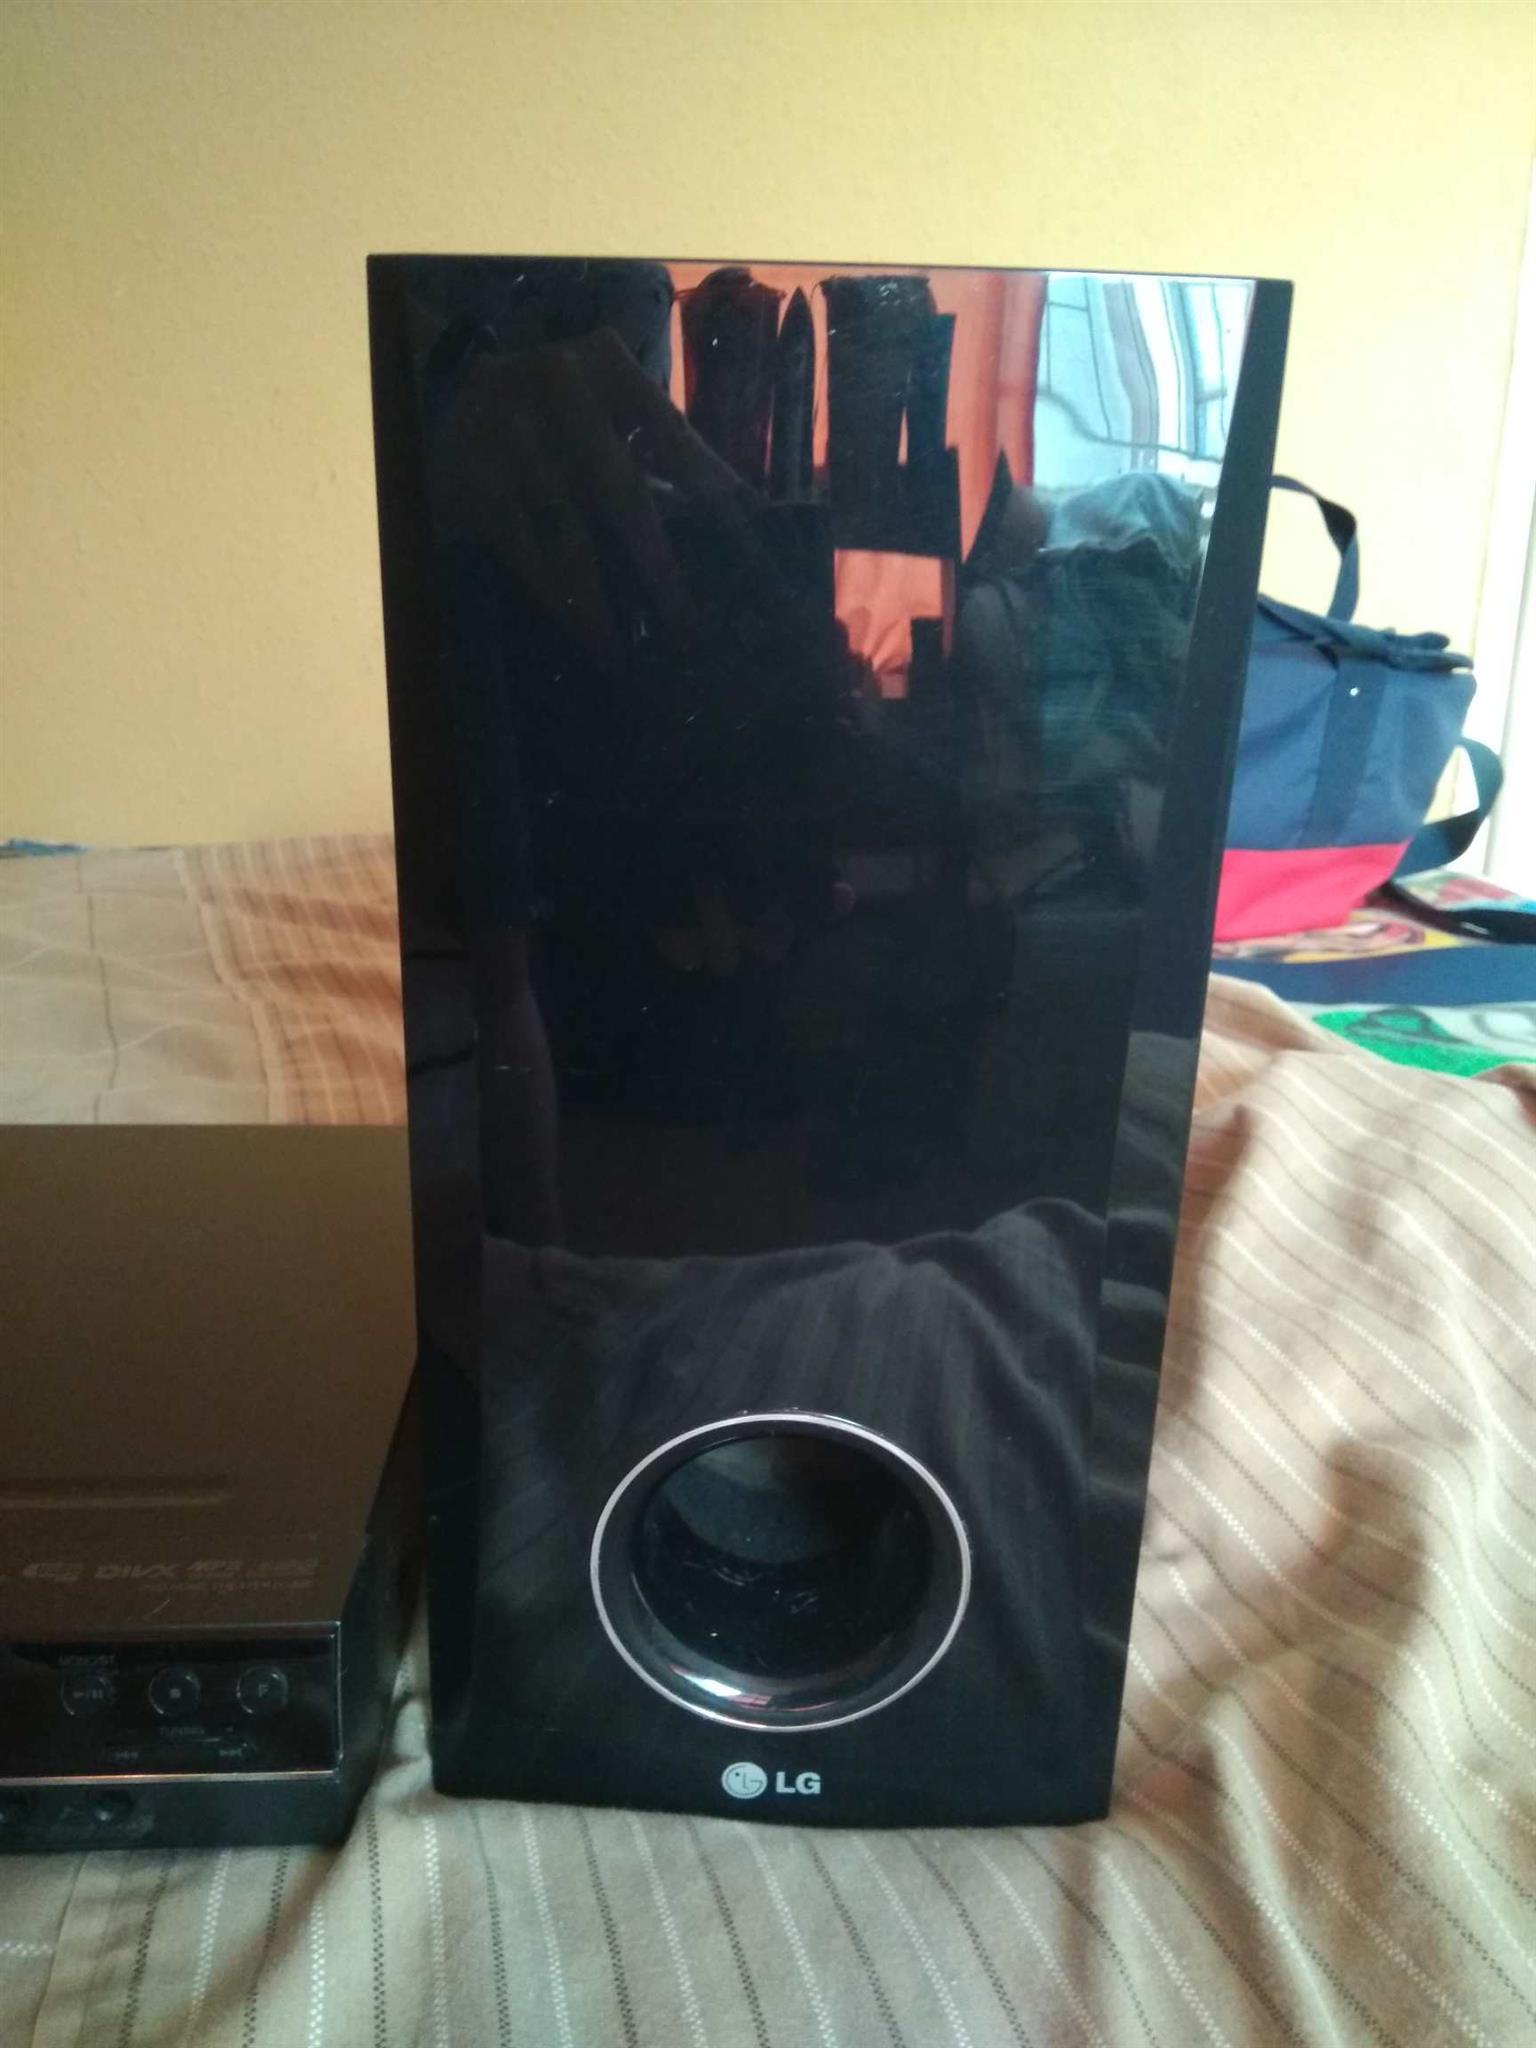 LG Home Theater - DVD Player, Mp3, DivX, etc.